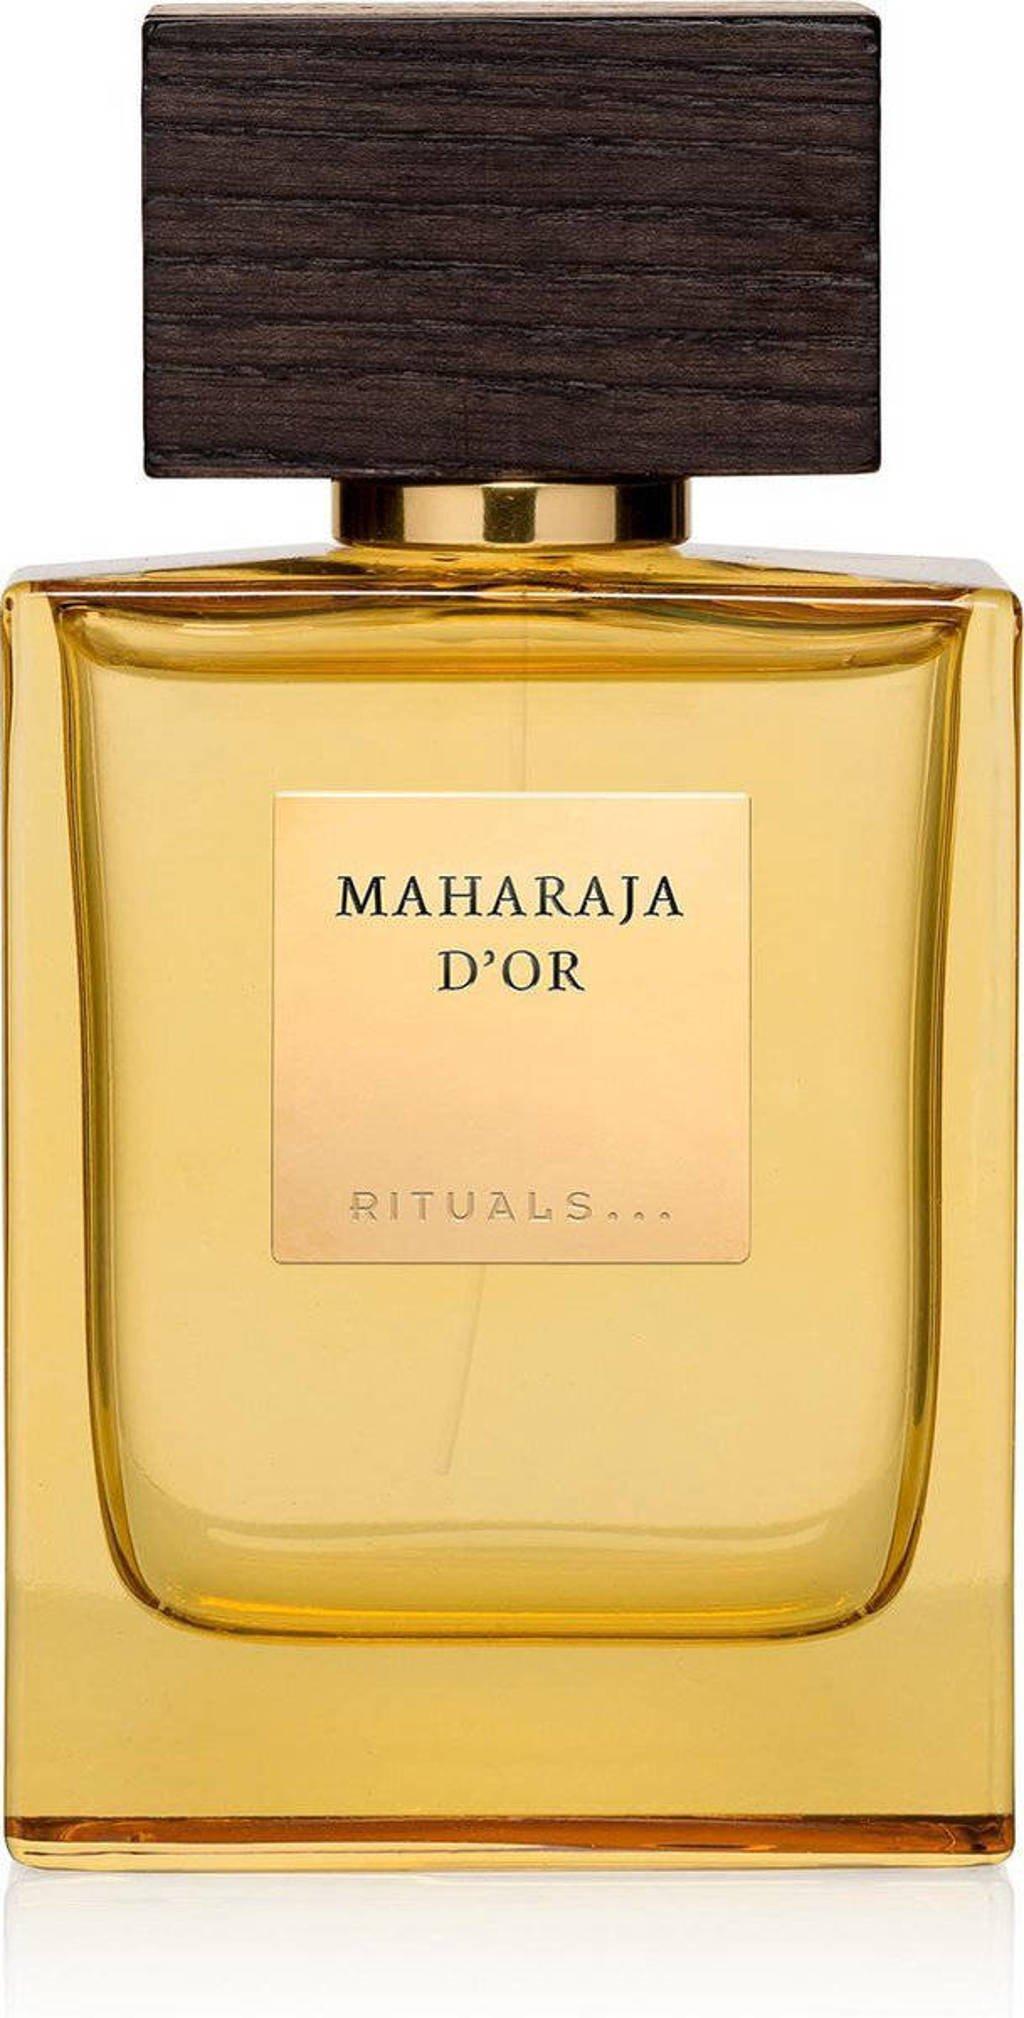 Rituals Ritual Of Oriental Essences Maharaja d'Or - 60 ml